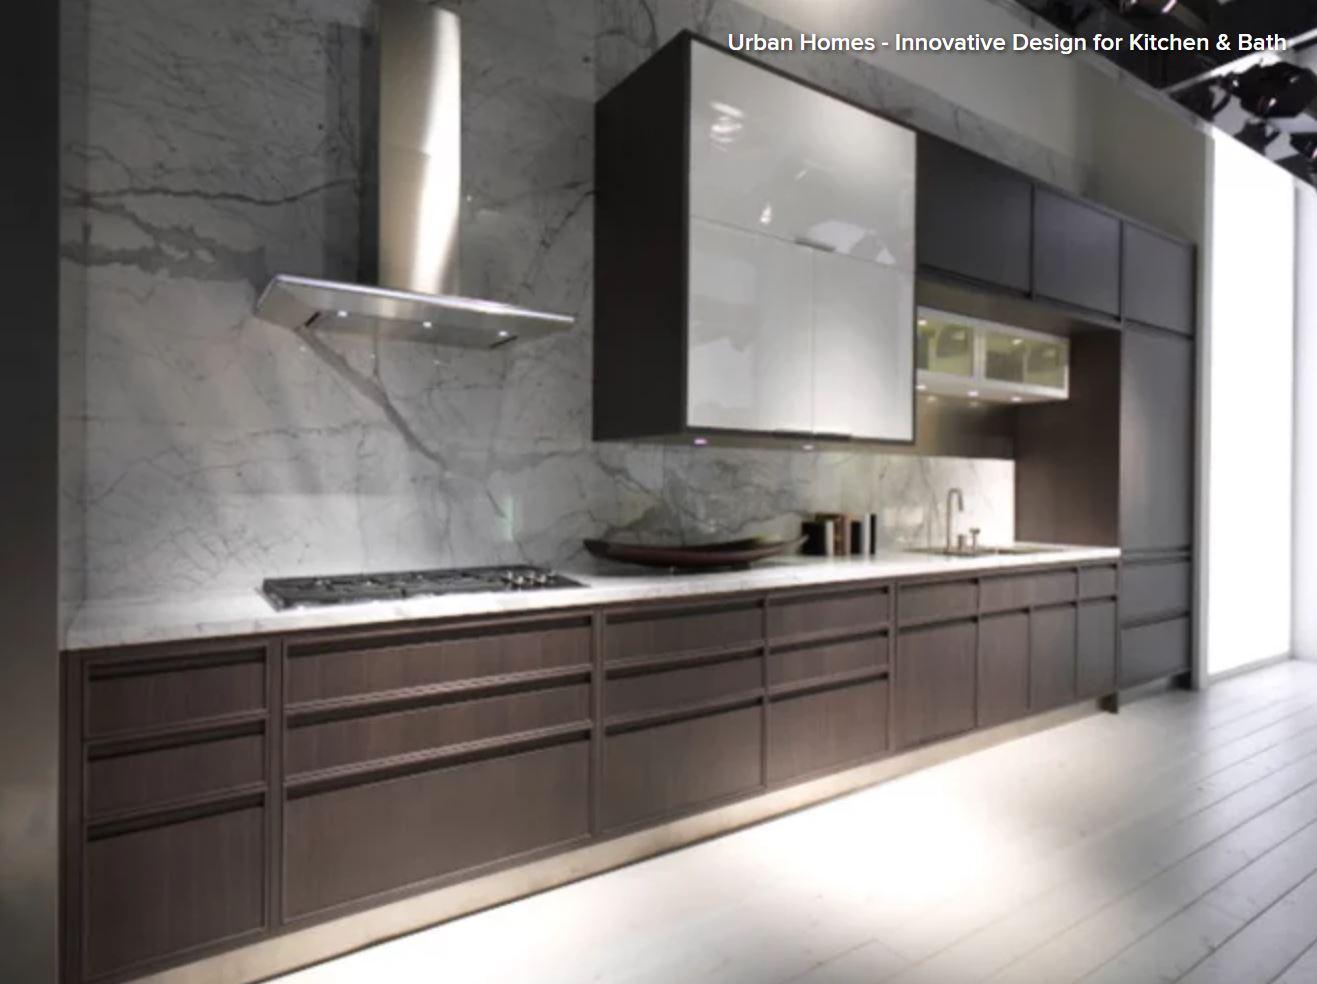 Kitchen_Remodel_3.JPG